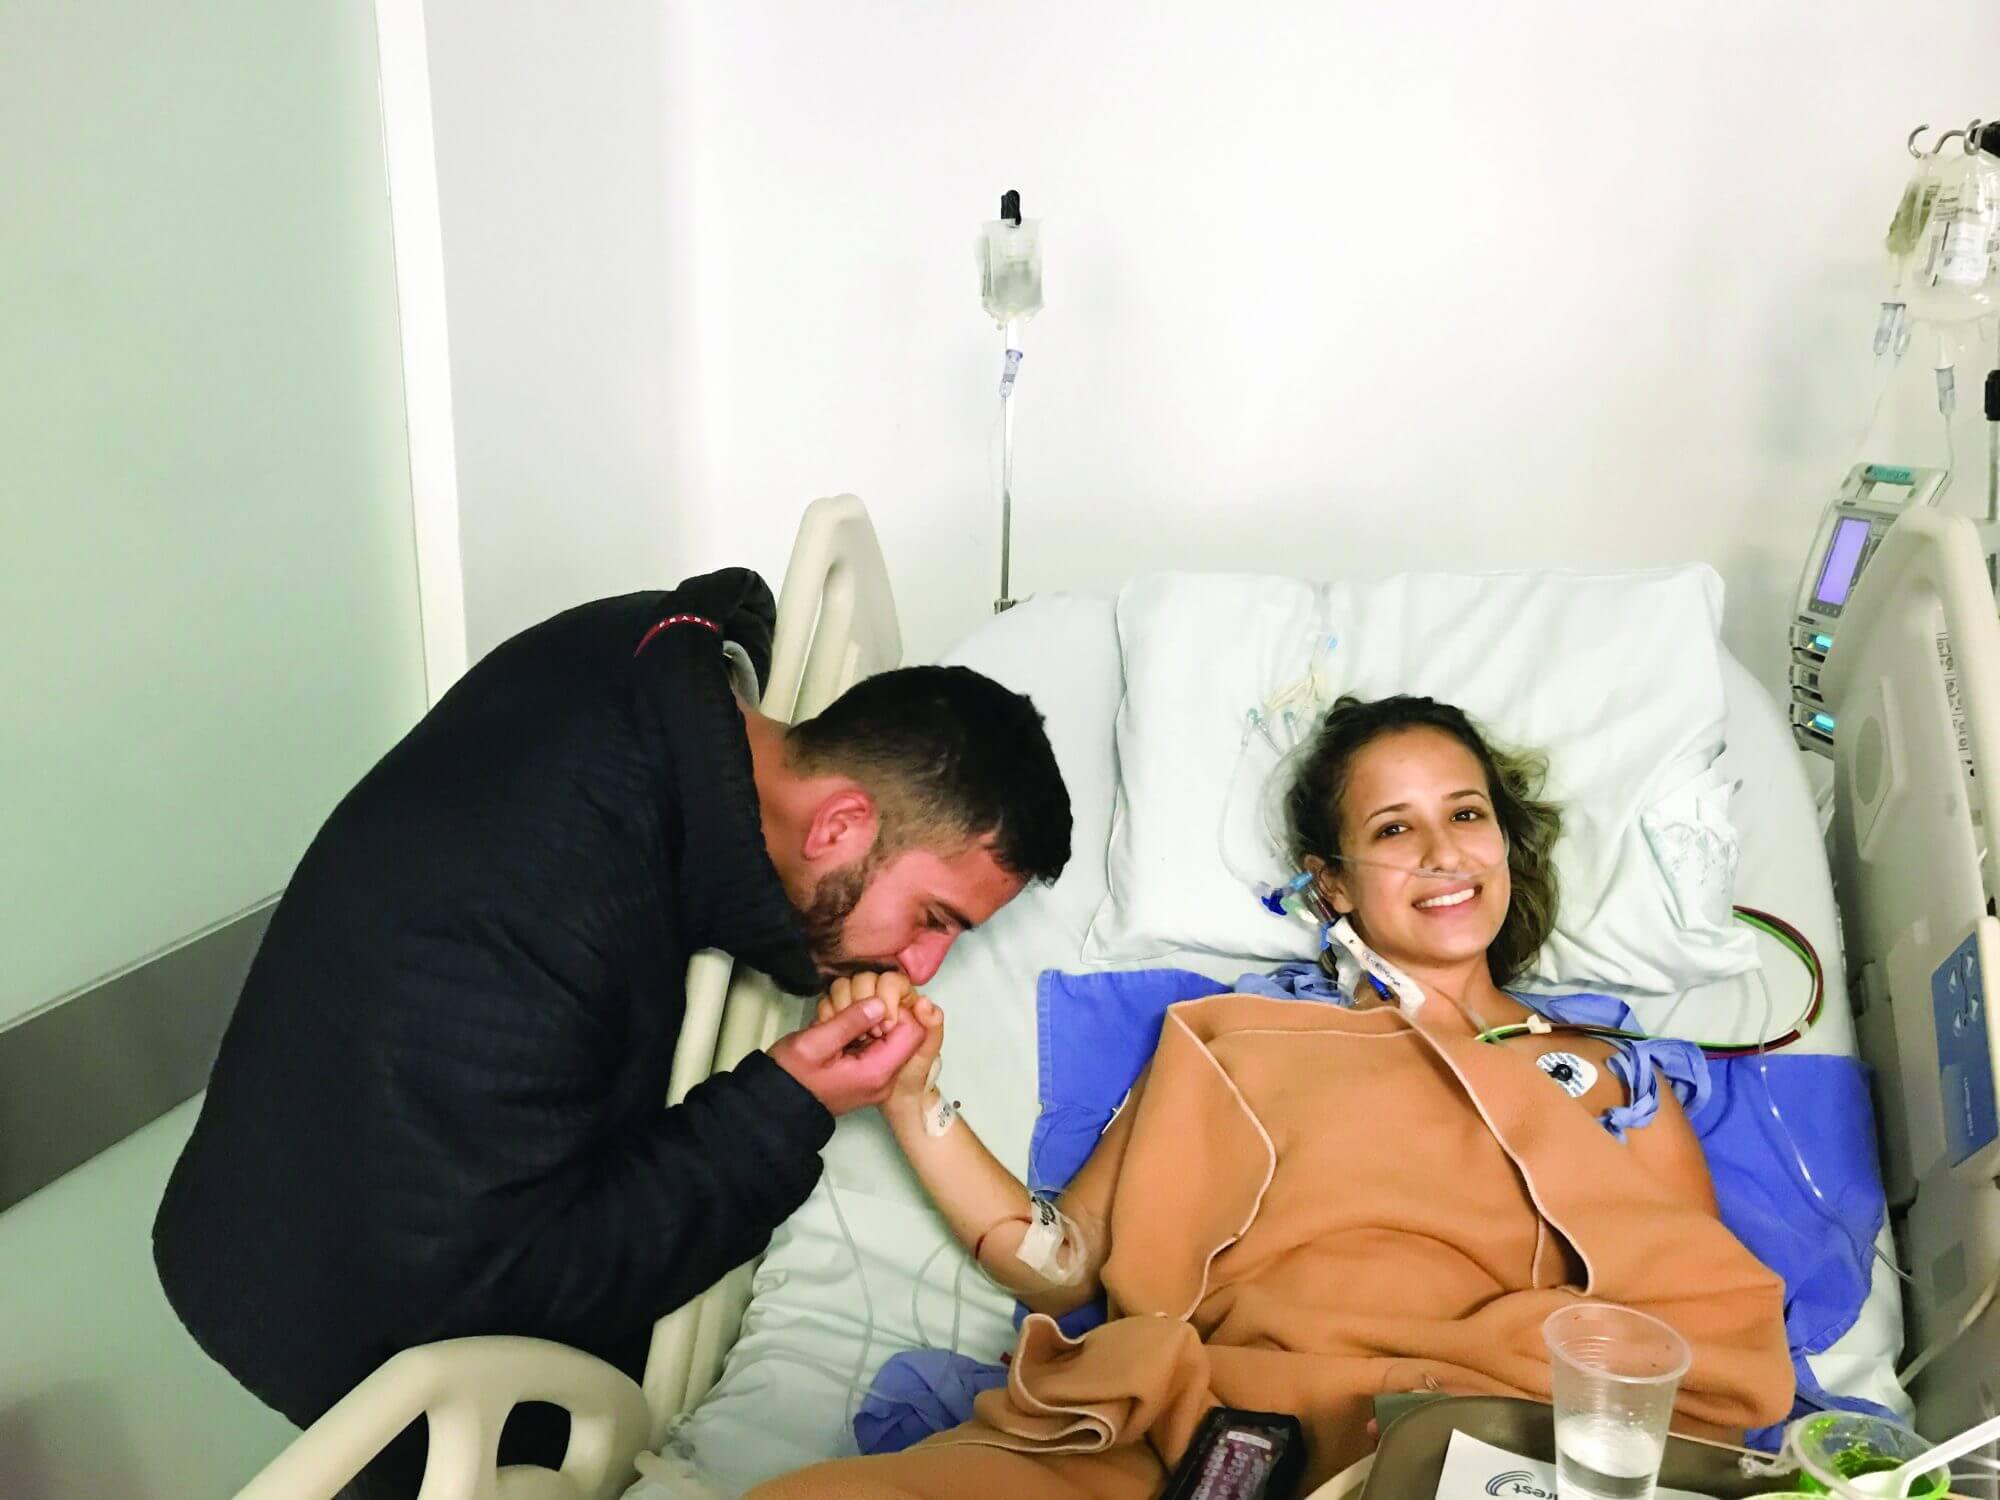 Laura Caicedo's fiancé, Julian Cortes, kisses her hand after her heart surgery.